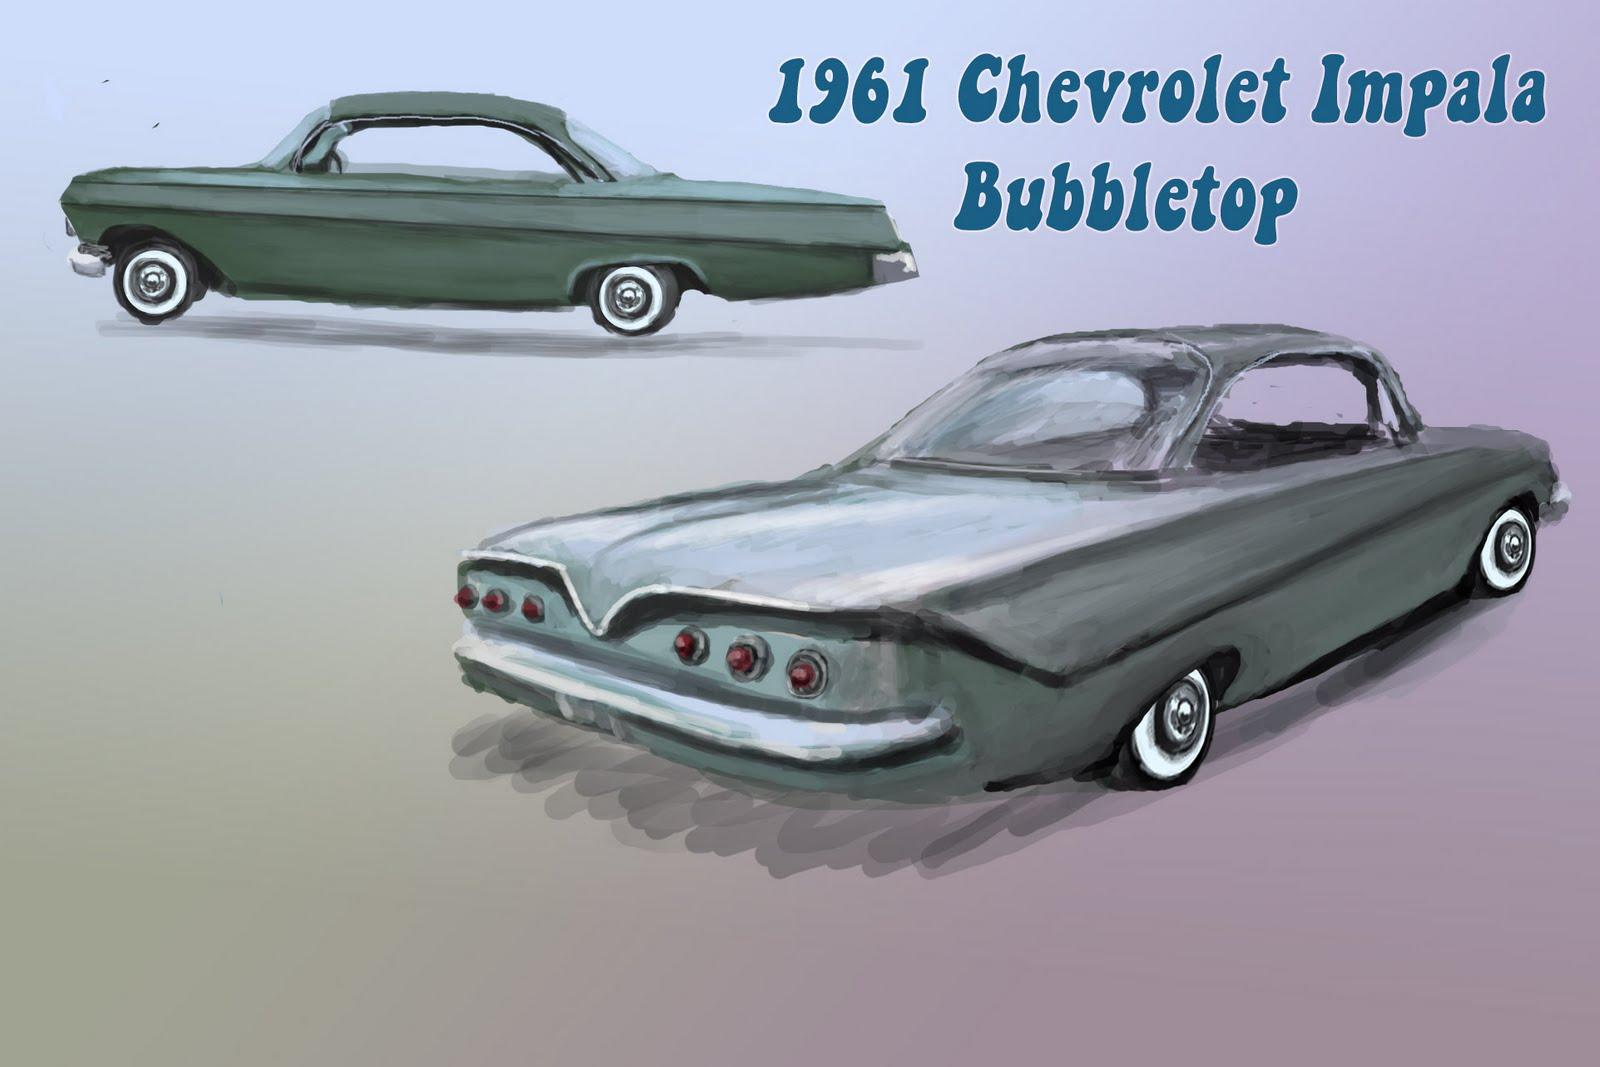 Fifties Paintings 1961 Chevrolet Impala Bubbletop Bubble Top